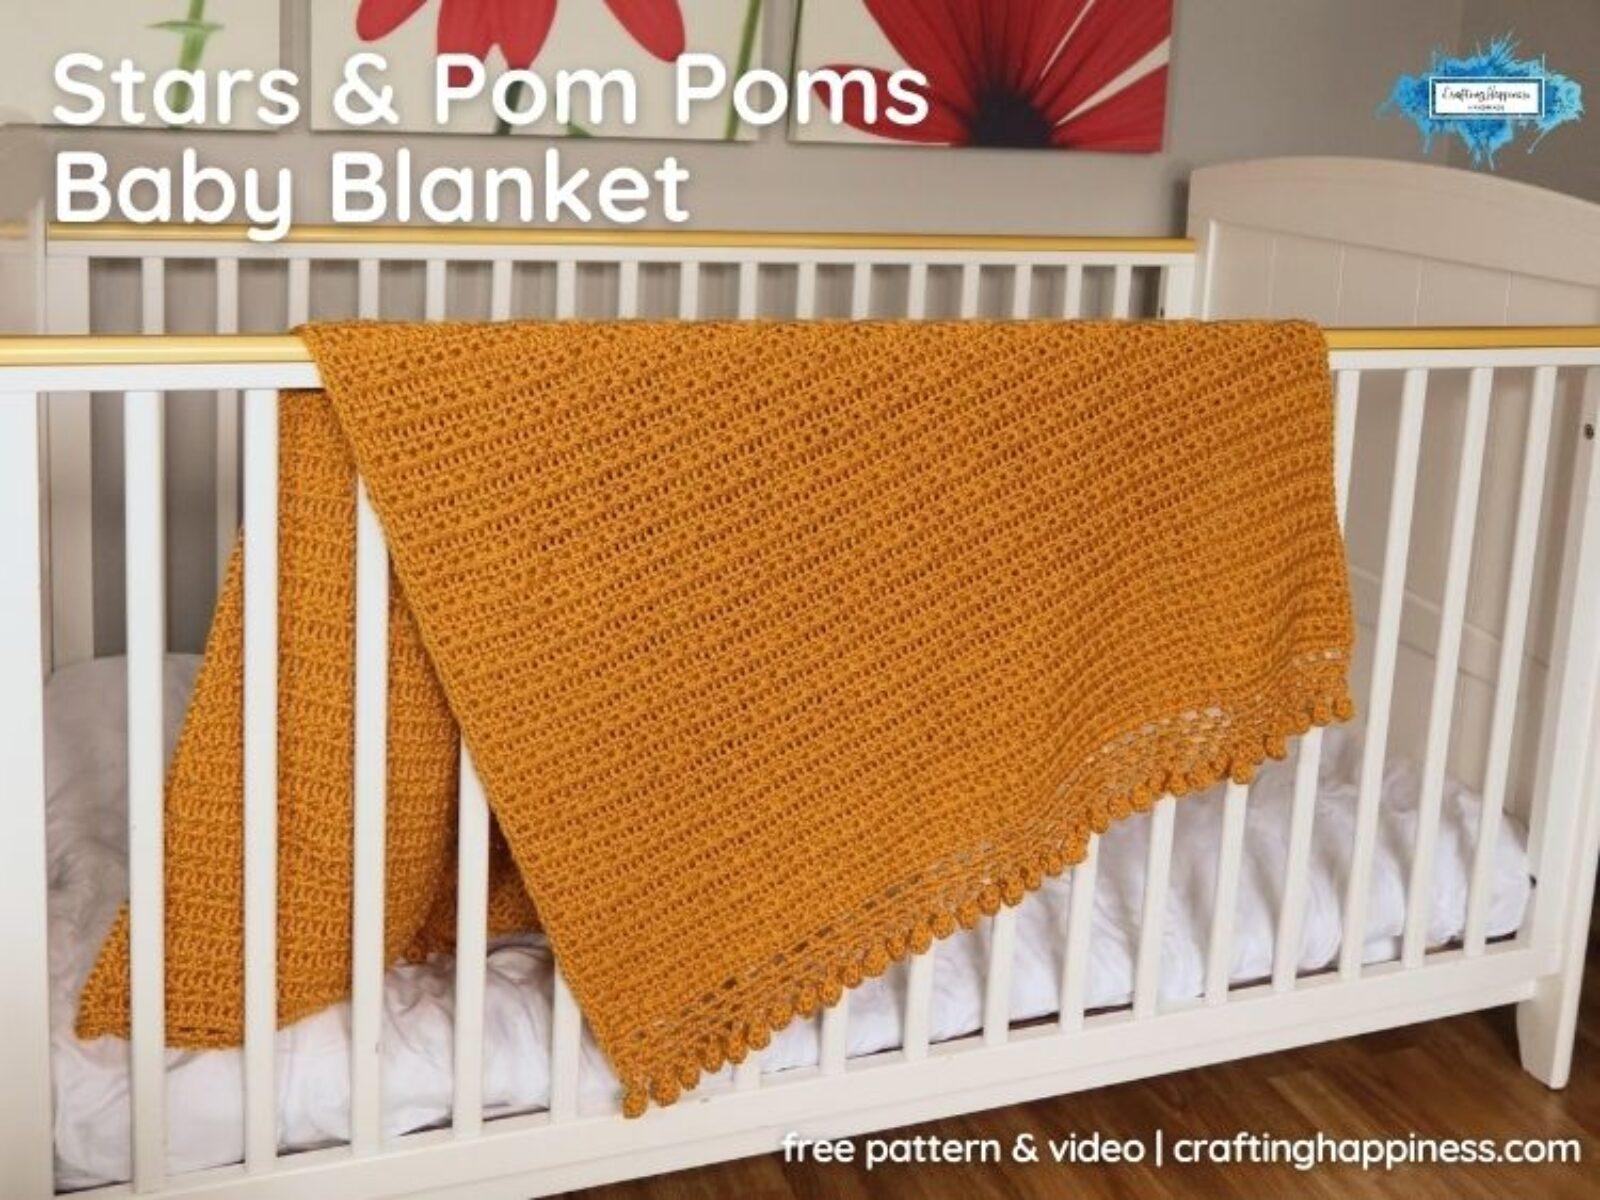 _FB BLOG POSTER - Stars & Pom Poms Baby Blanket